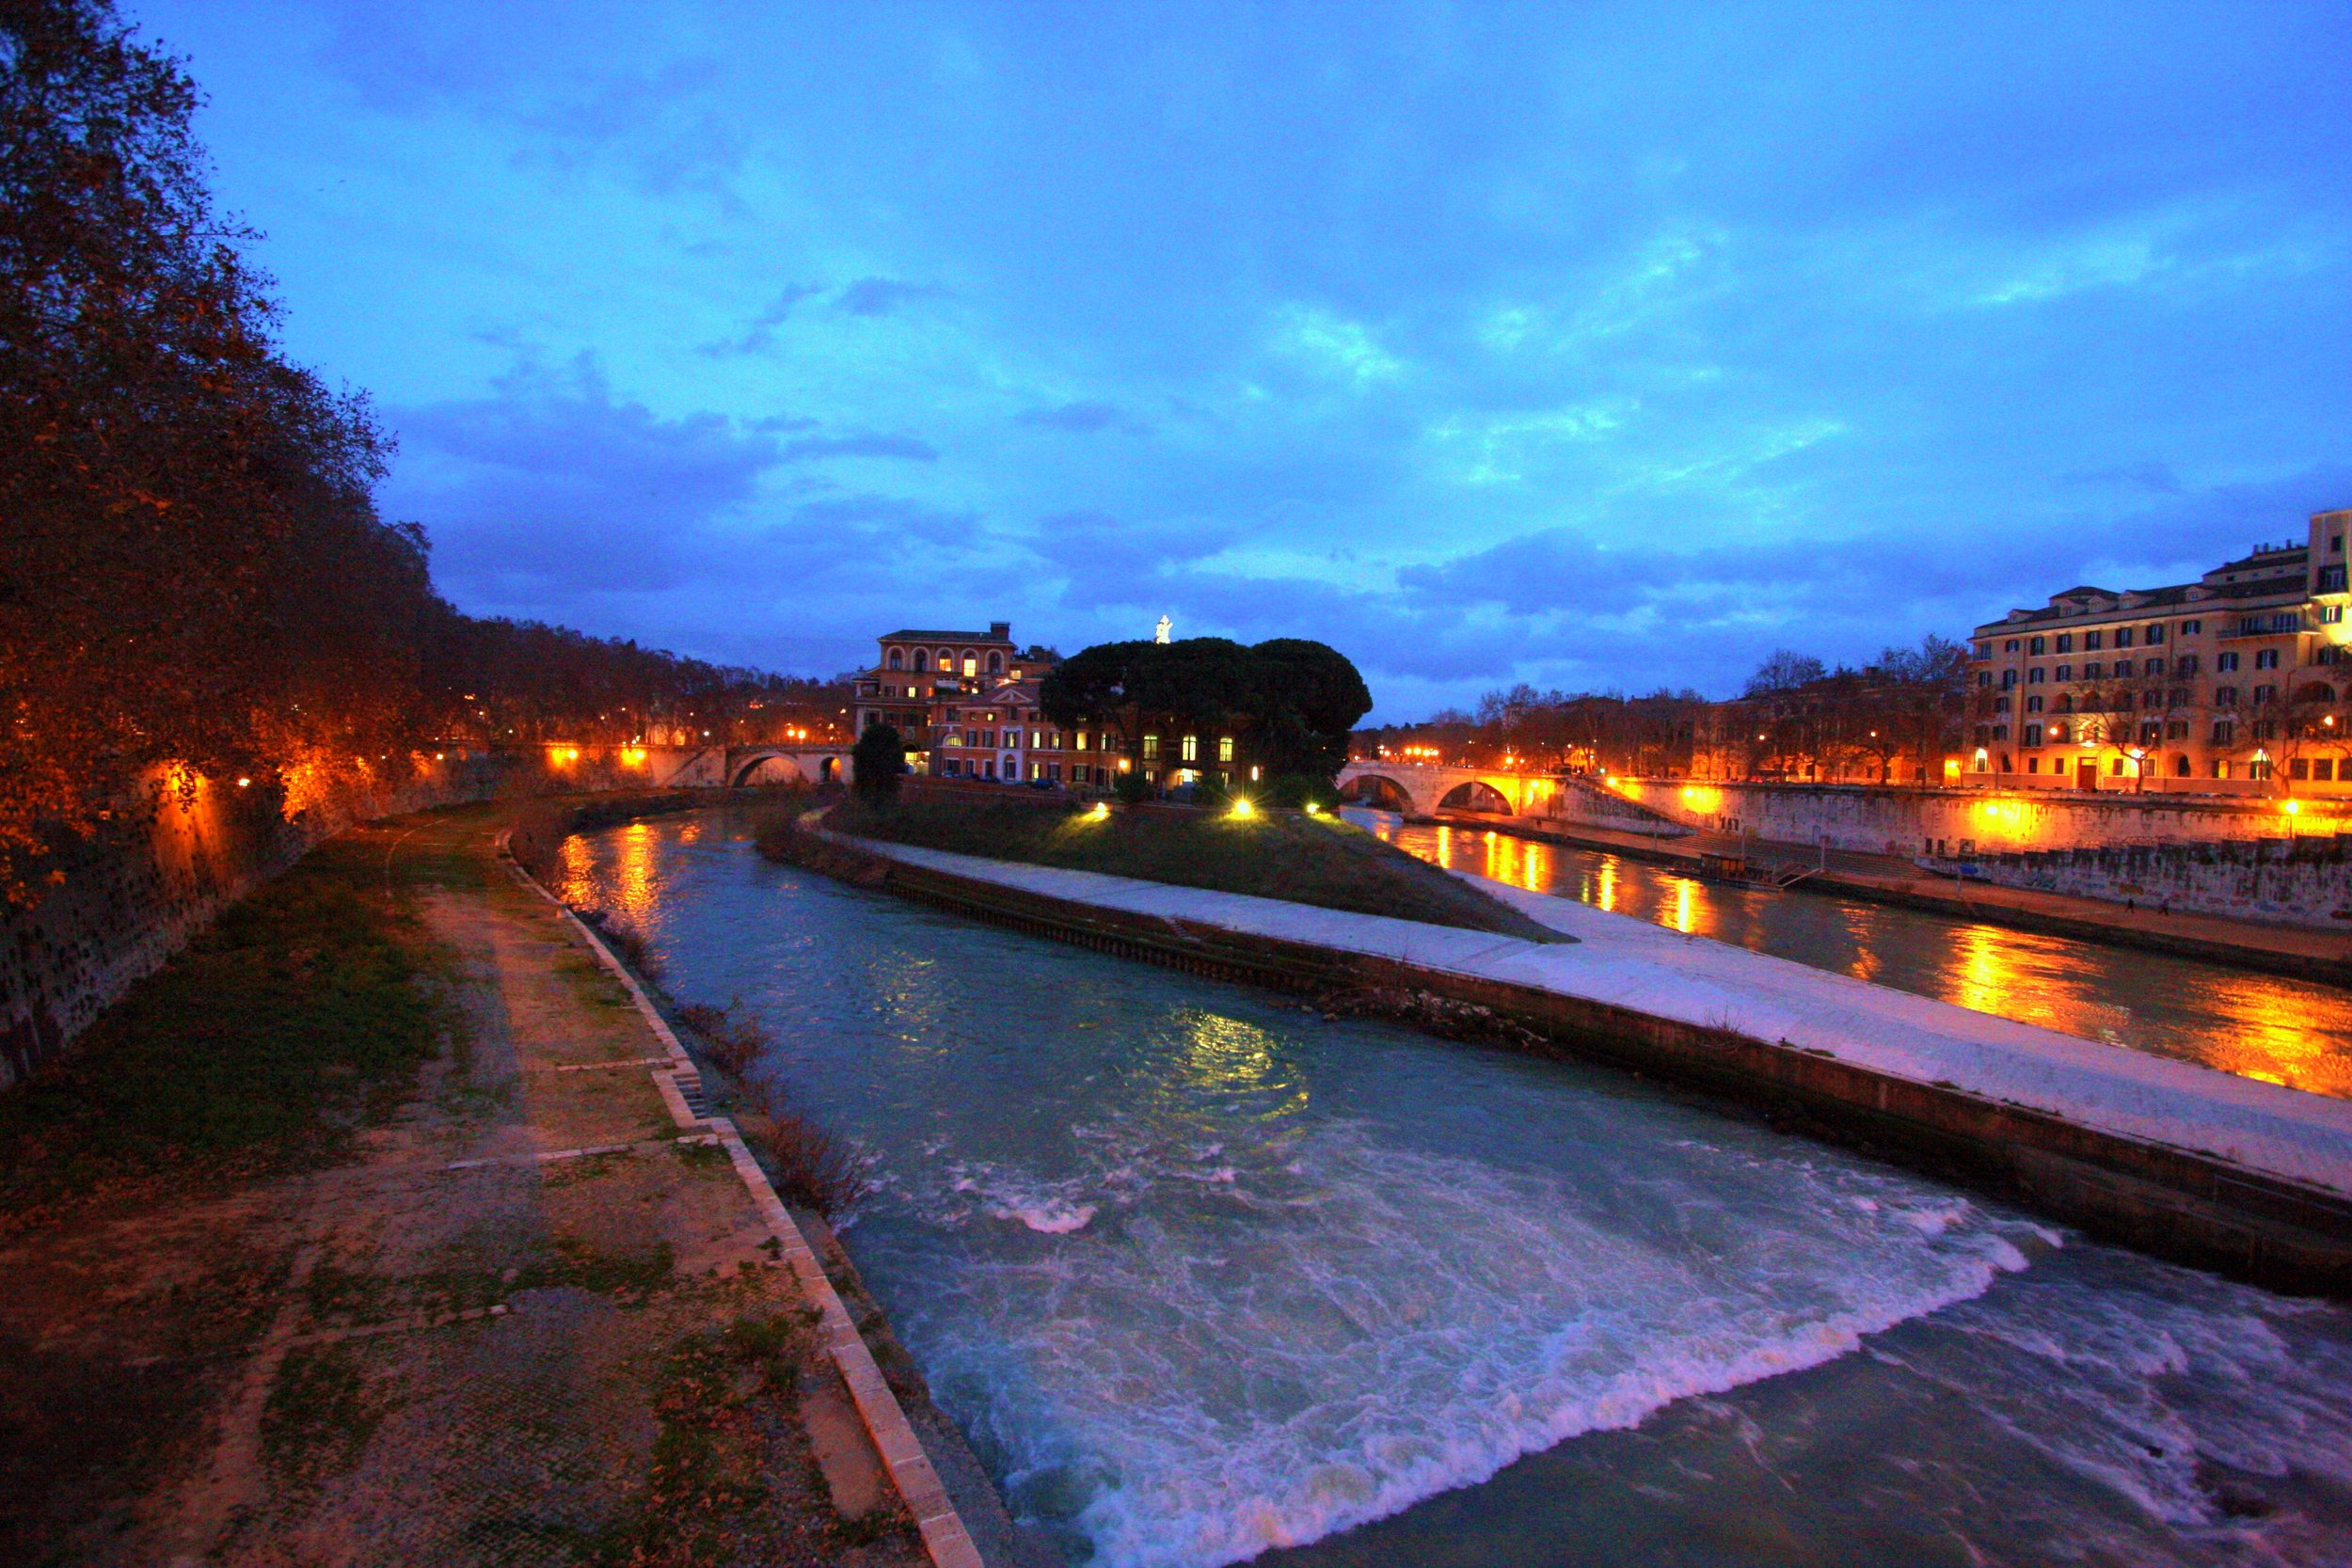 Island in Tiber River Rome